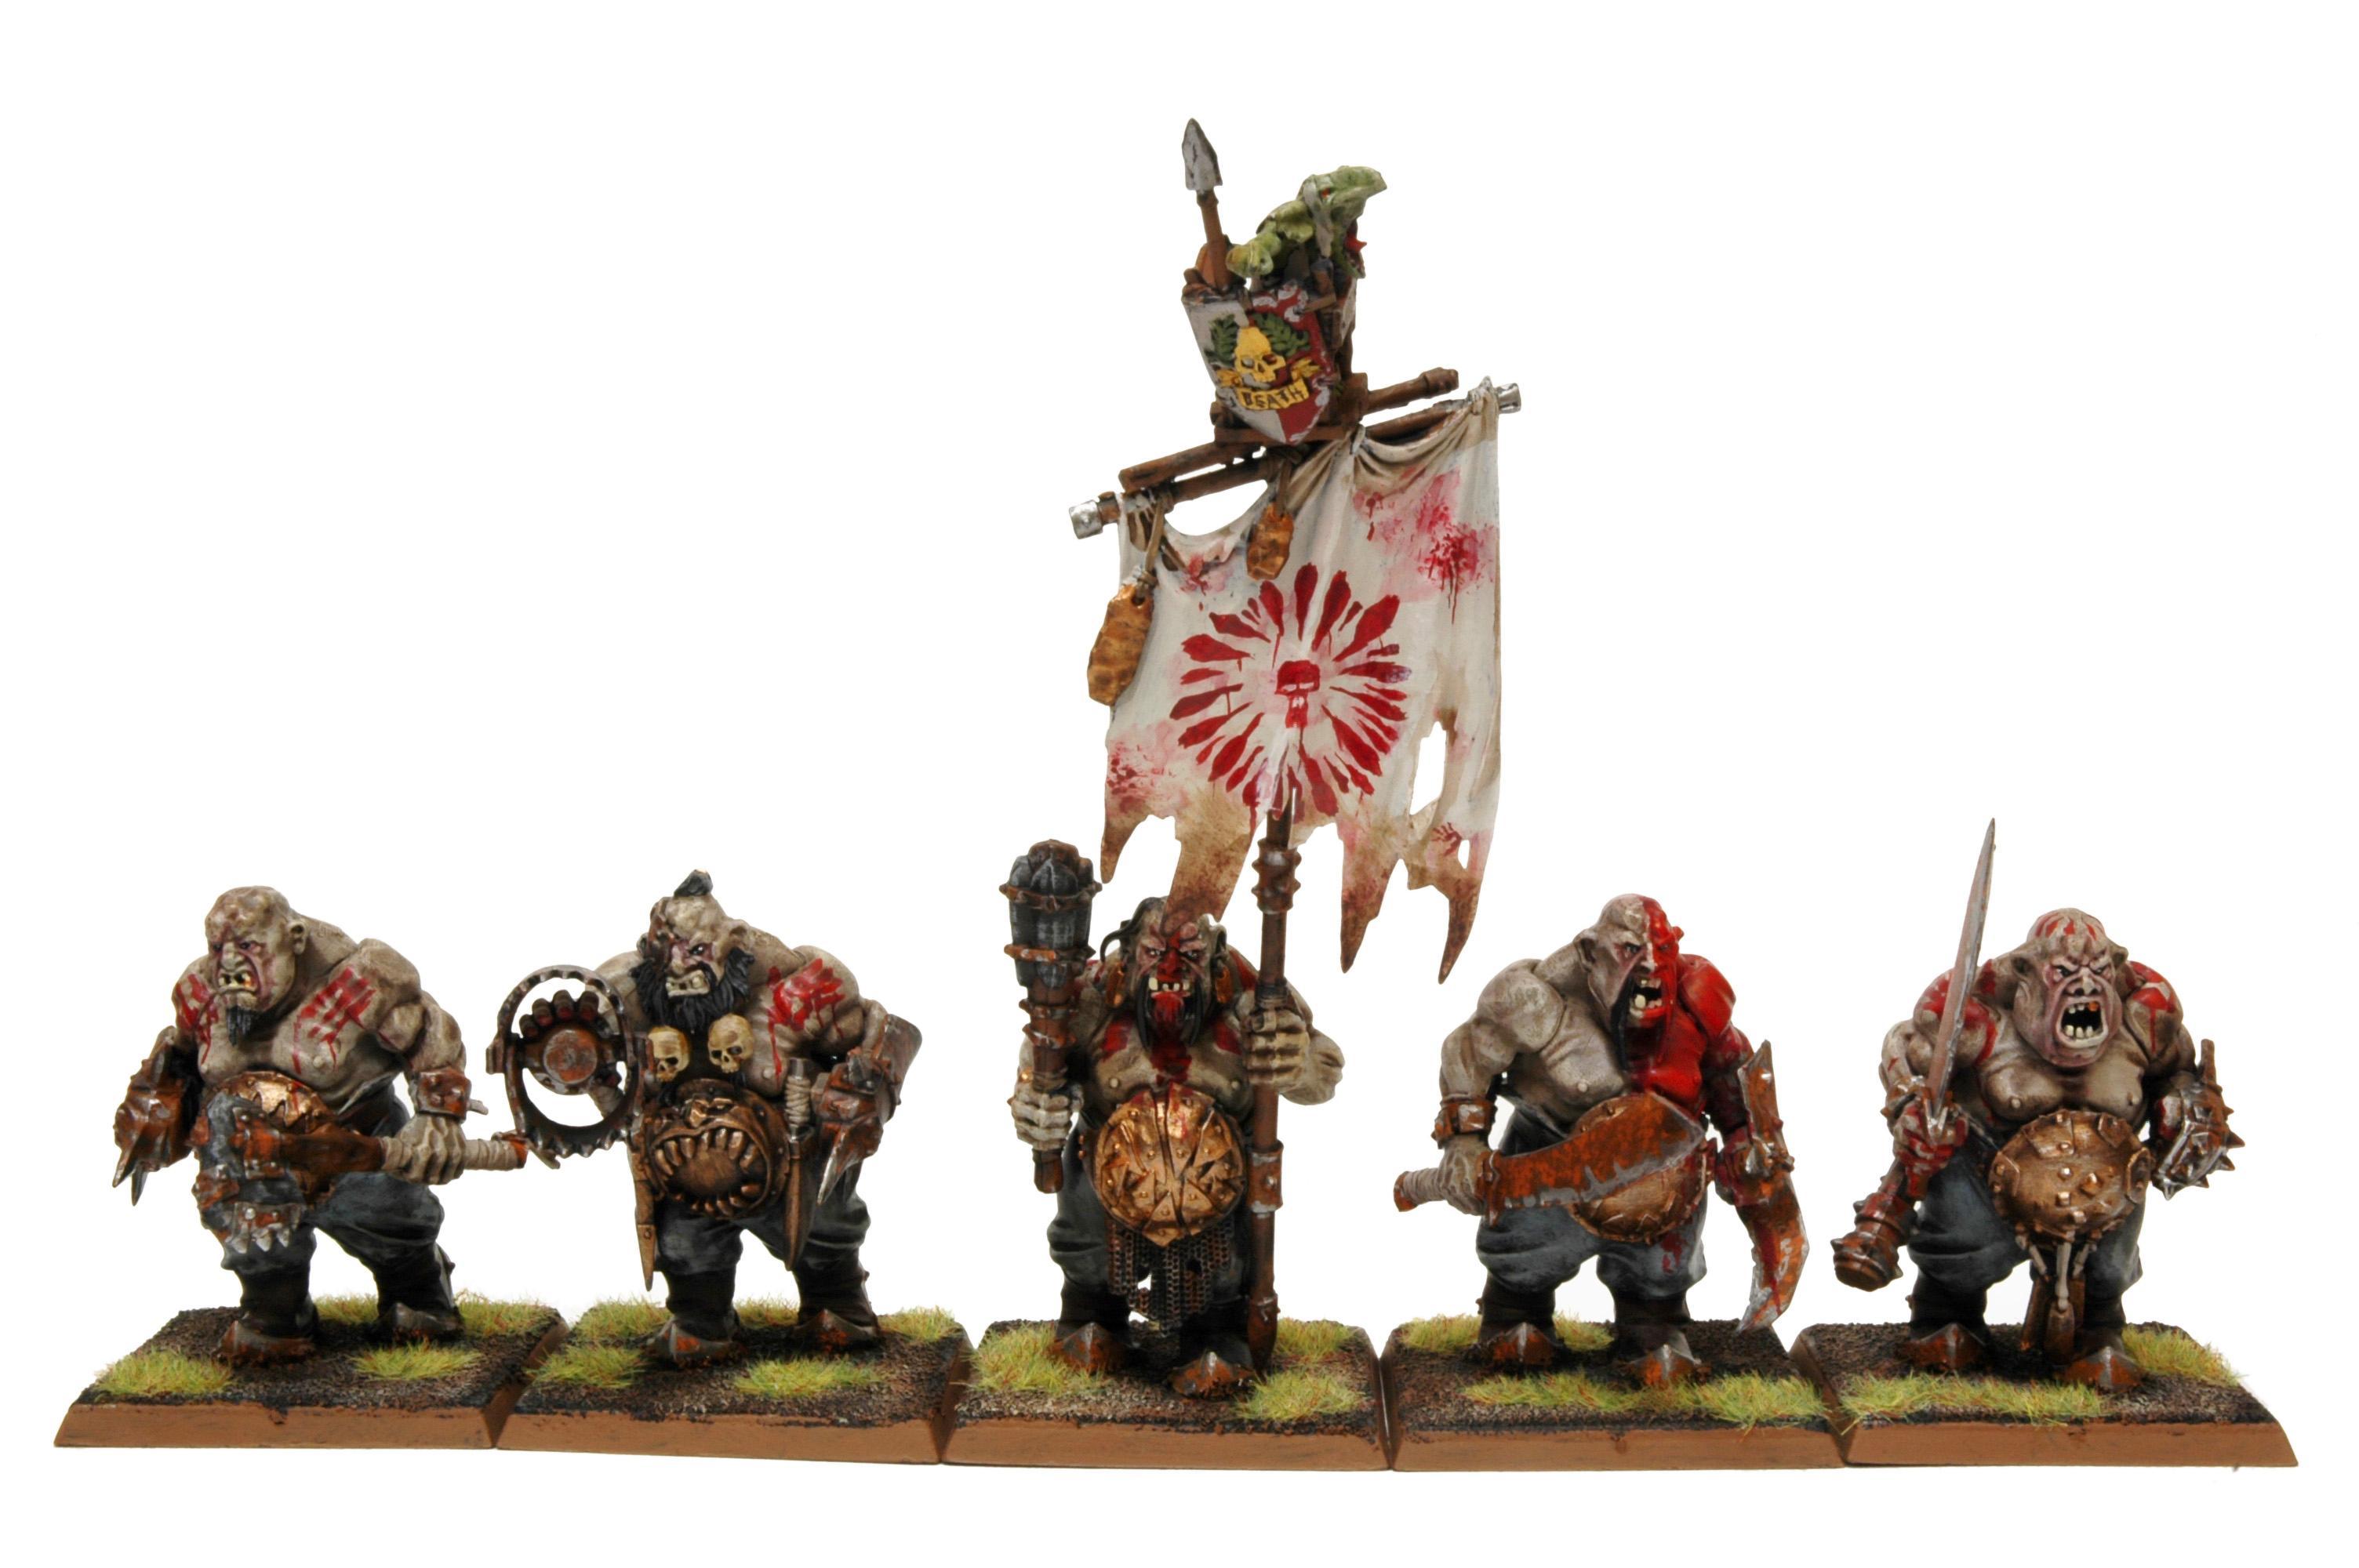 Bulls, Butcher, Ironguts, Kingdom, Leadbelcher, Ogres, Warpaint